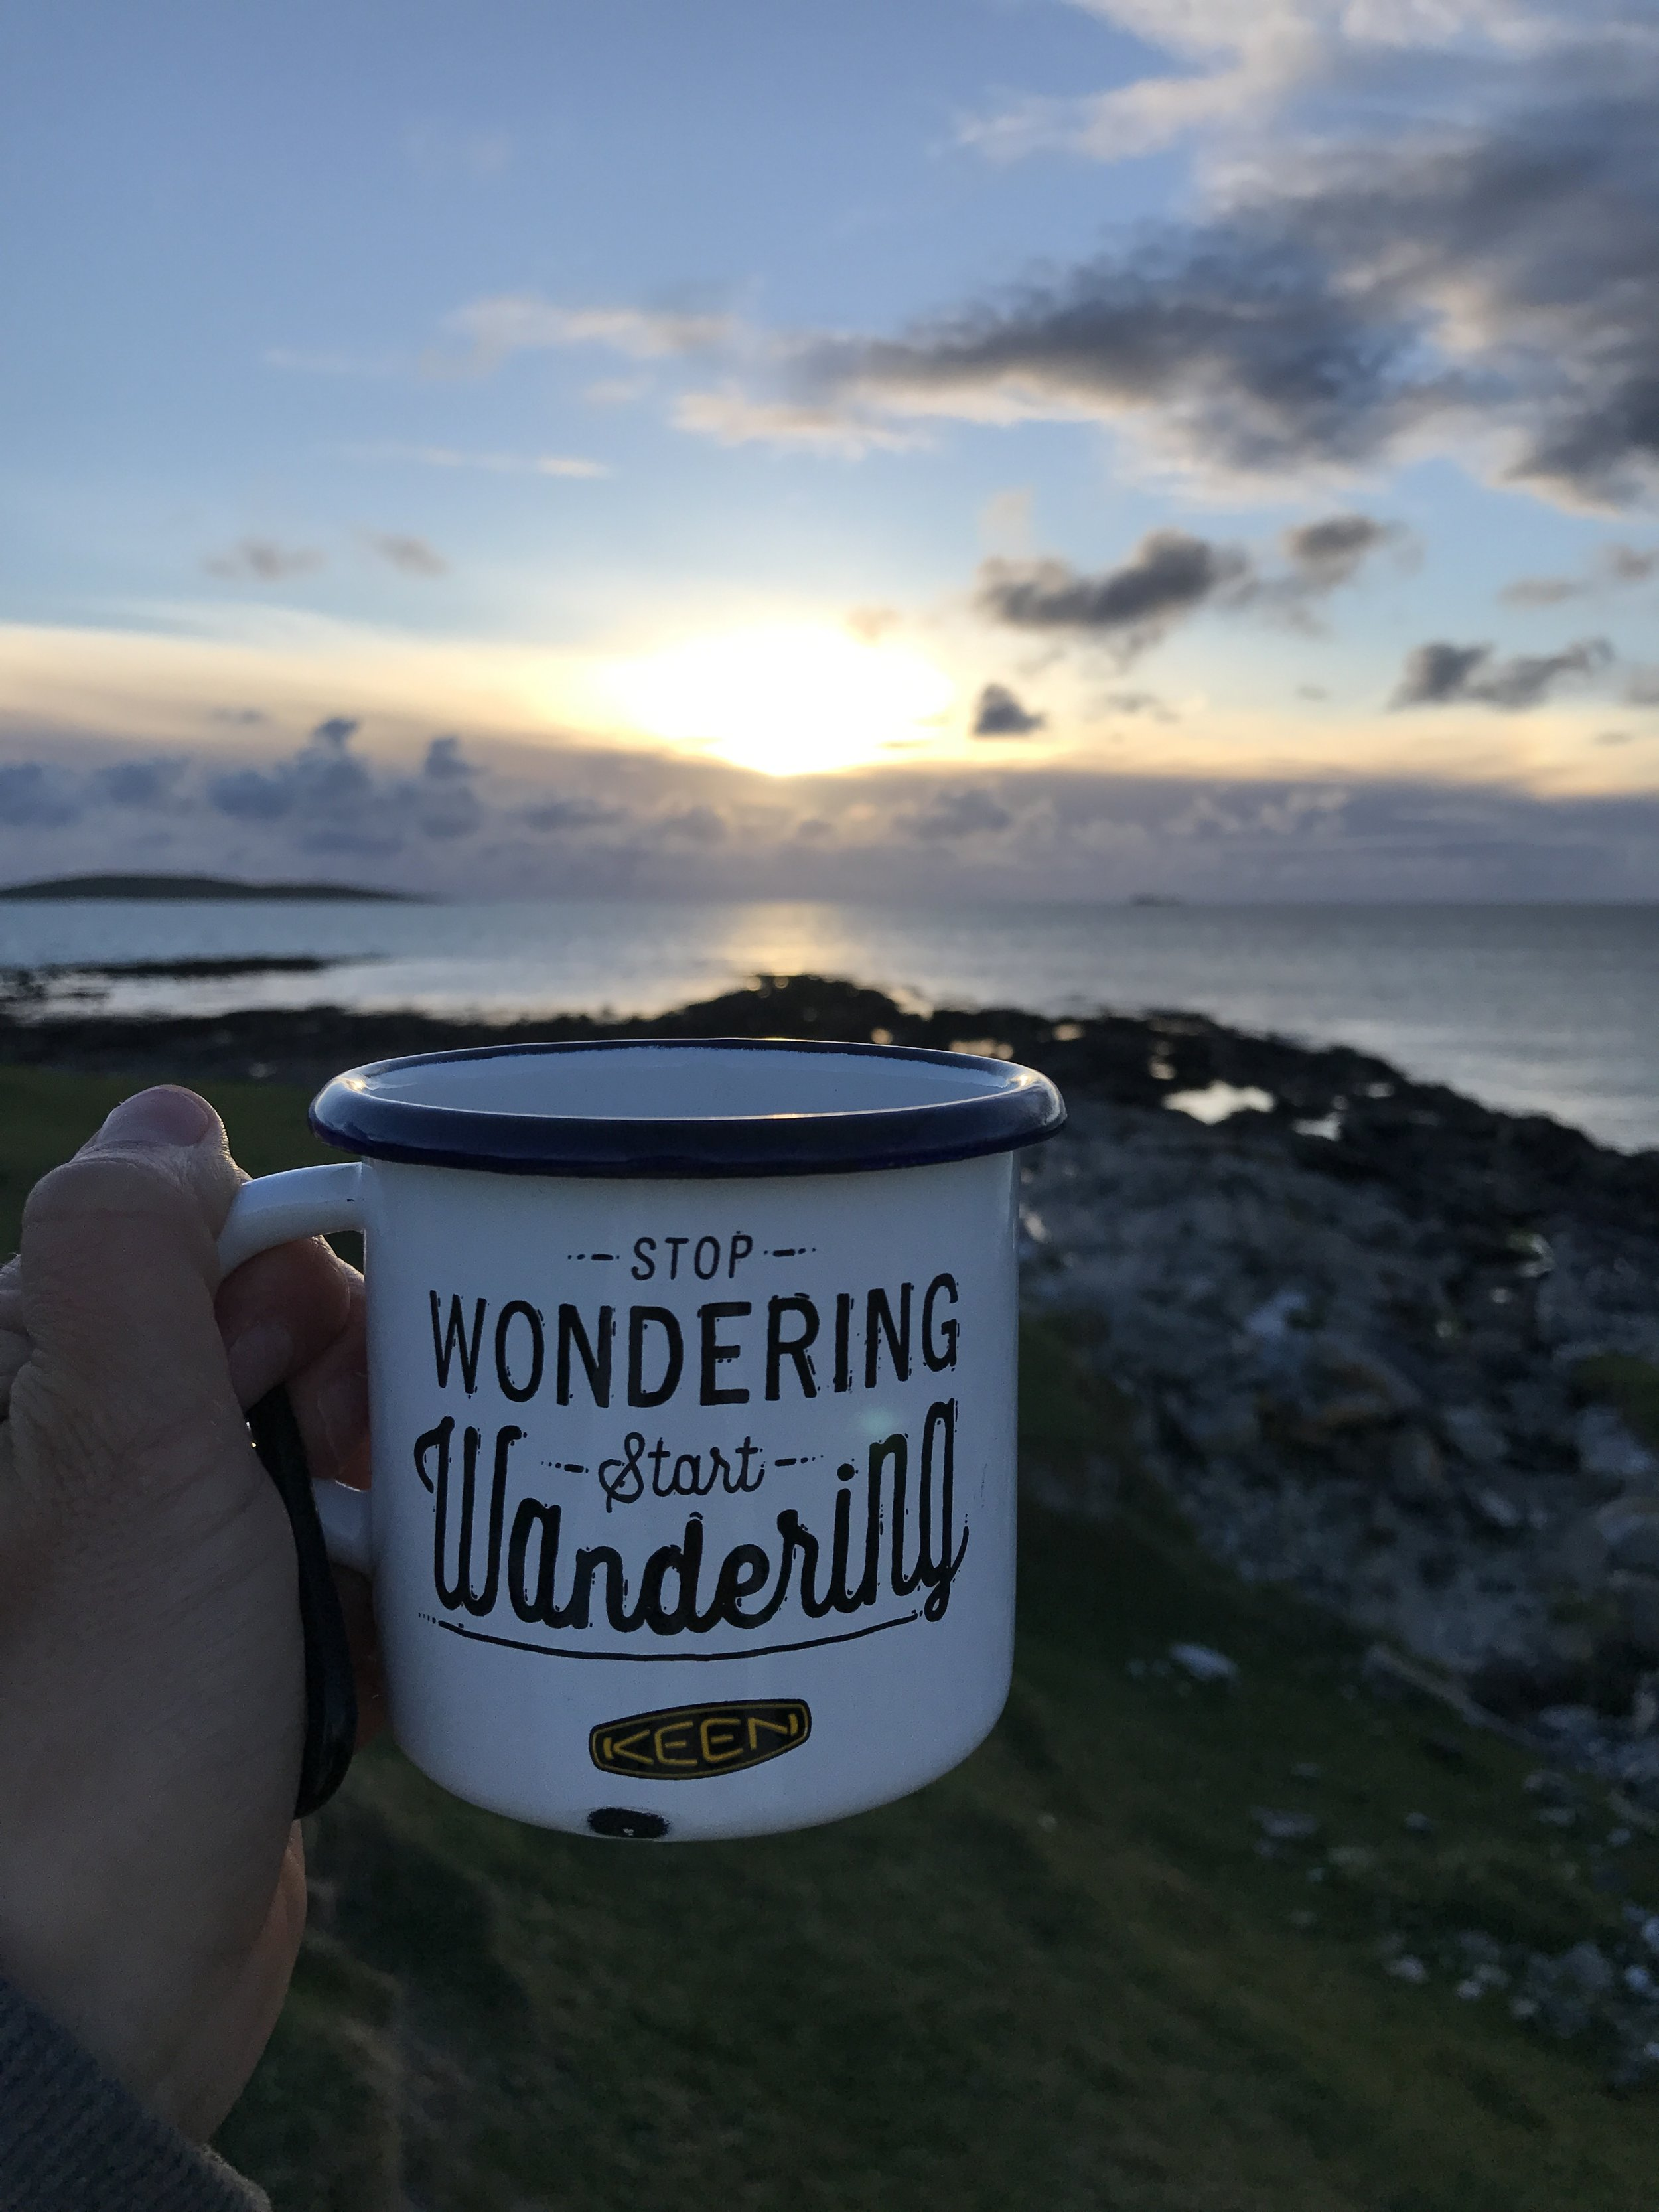 Luskentyre Beach, Isle of Harris Outer Hebrides, Scotland Adventure